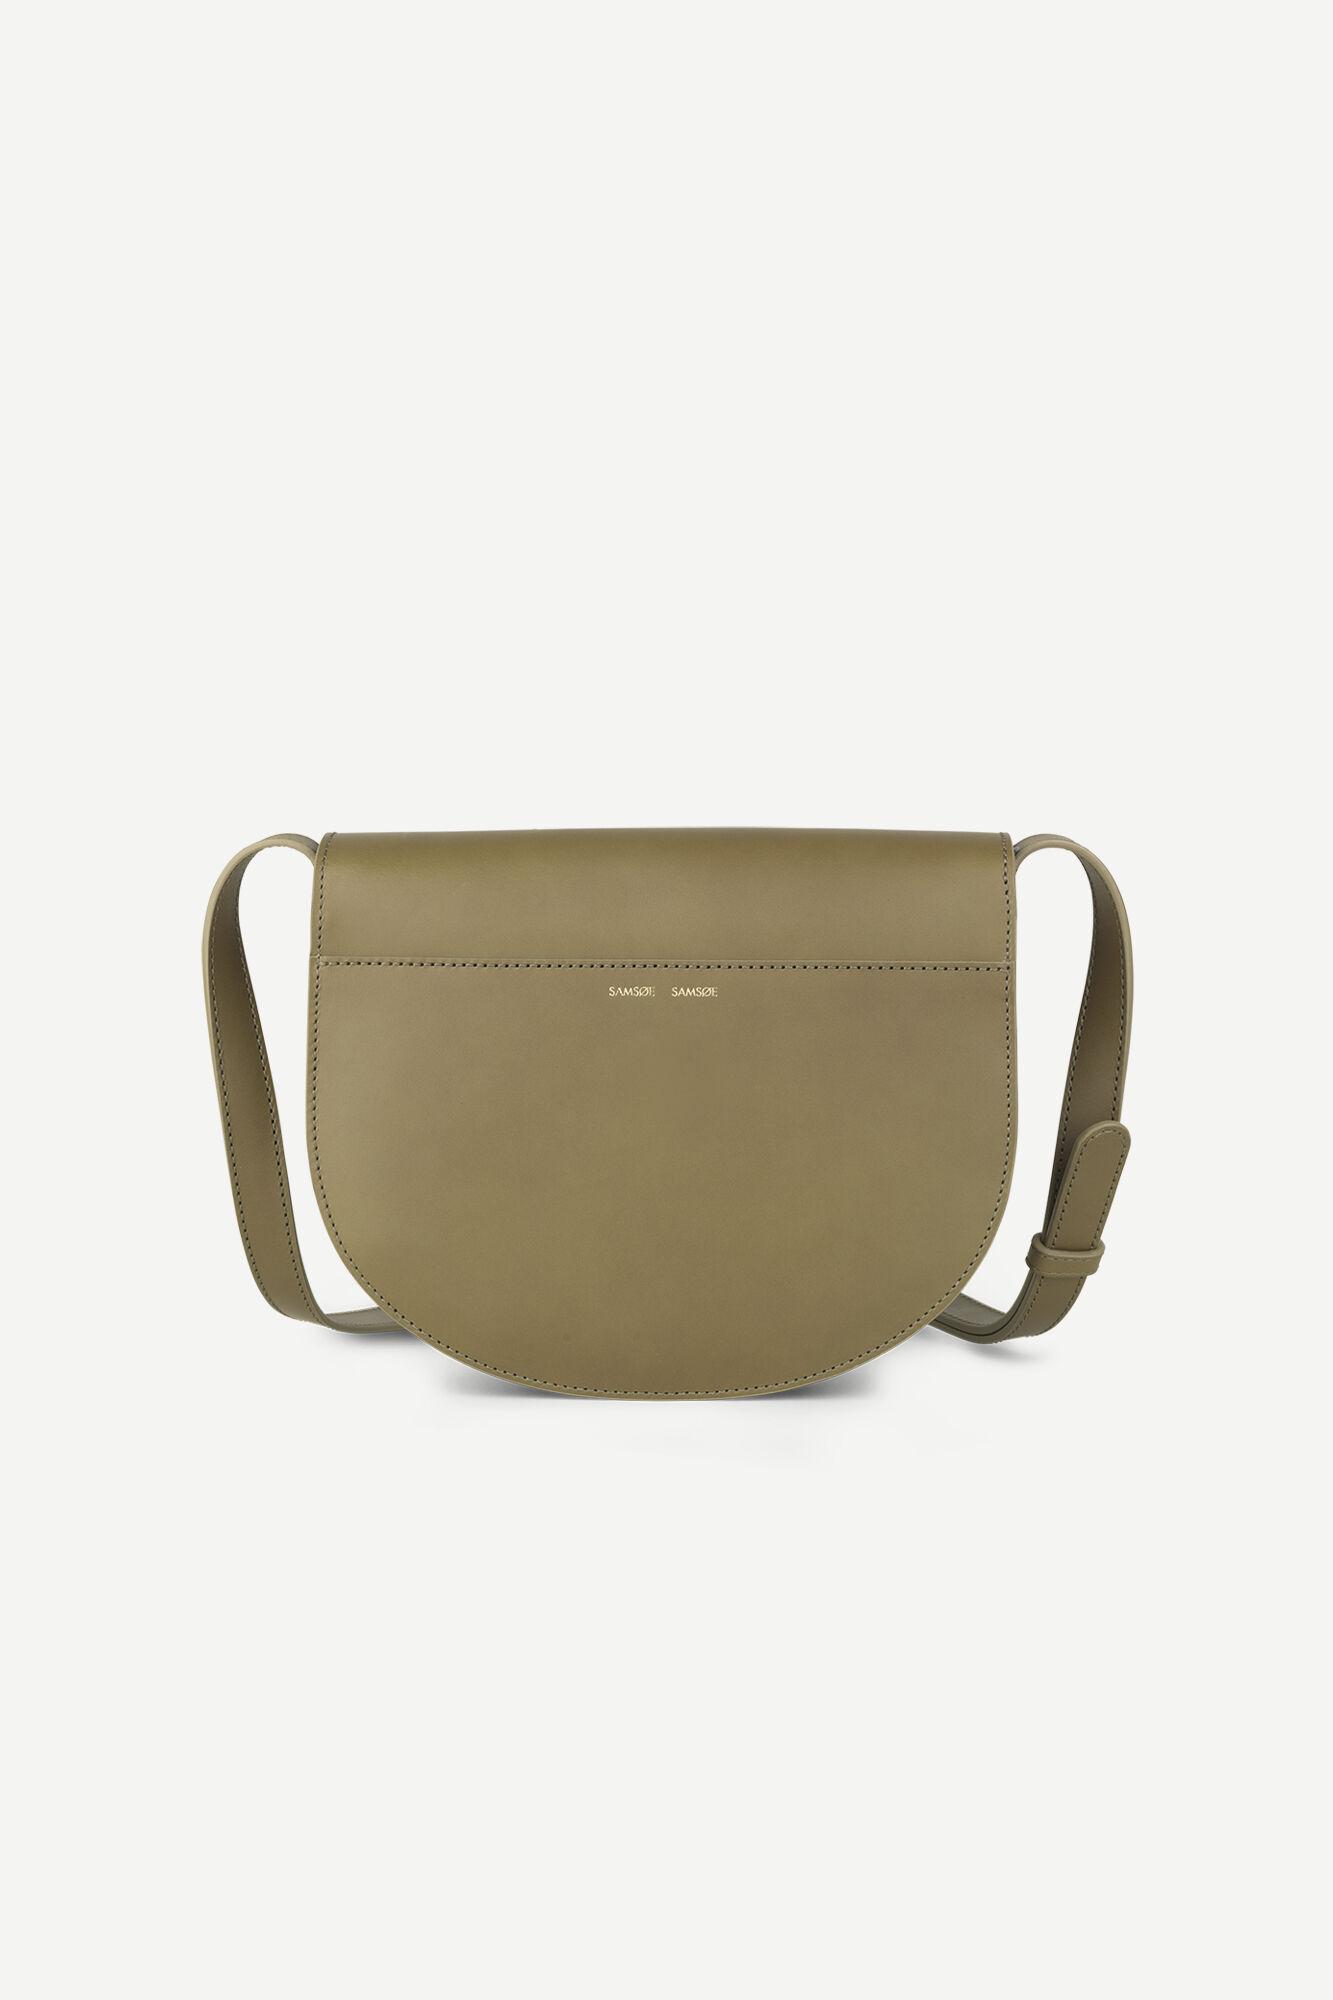 Carelle bag 11519